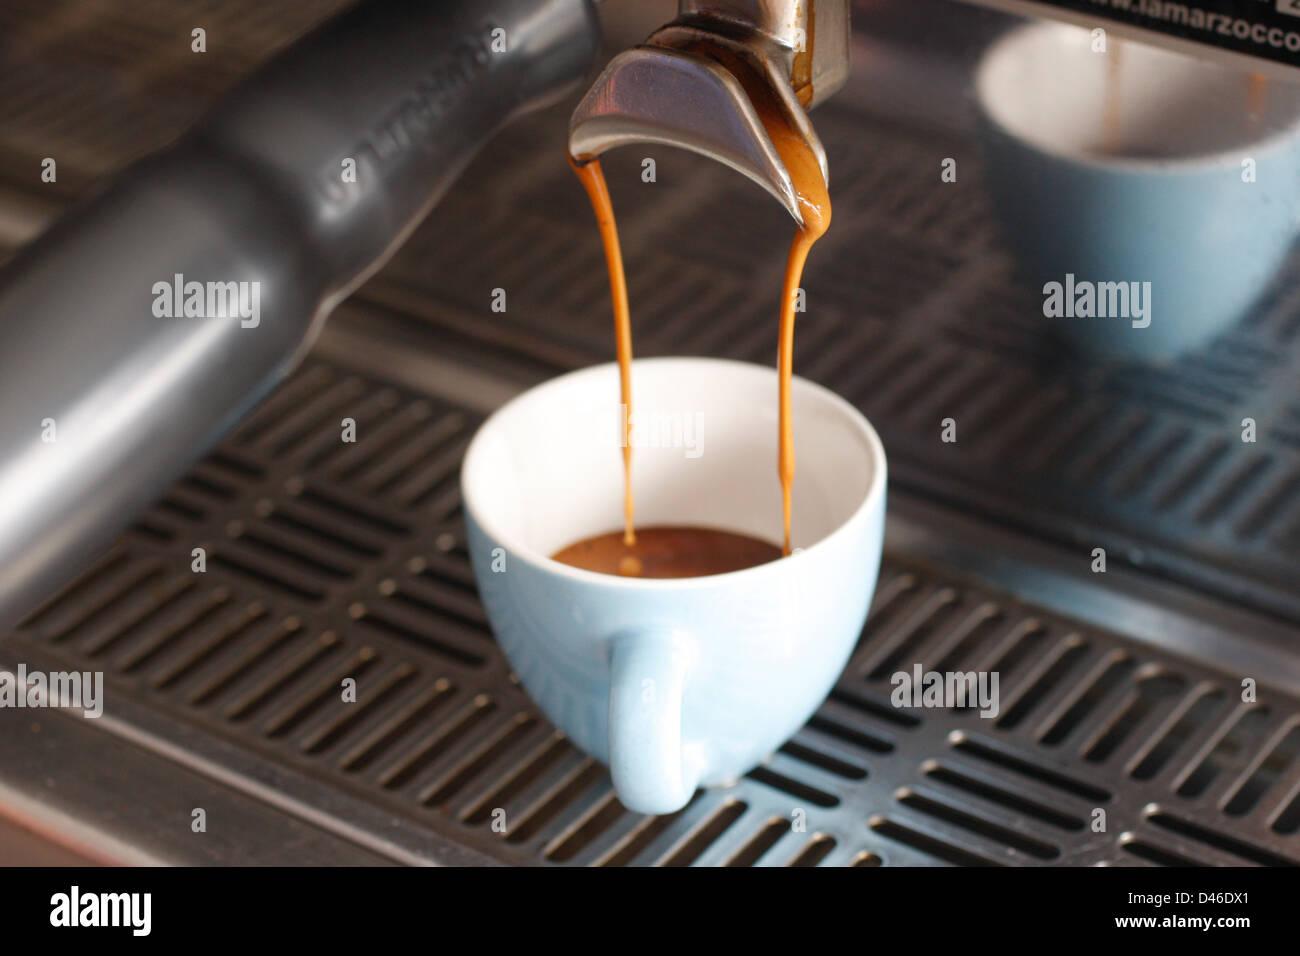 Espresso being brewed - Stock Image